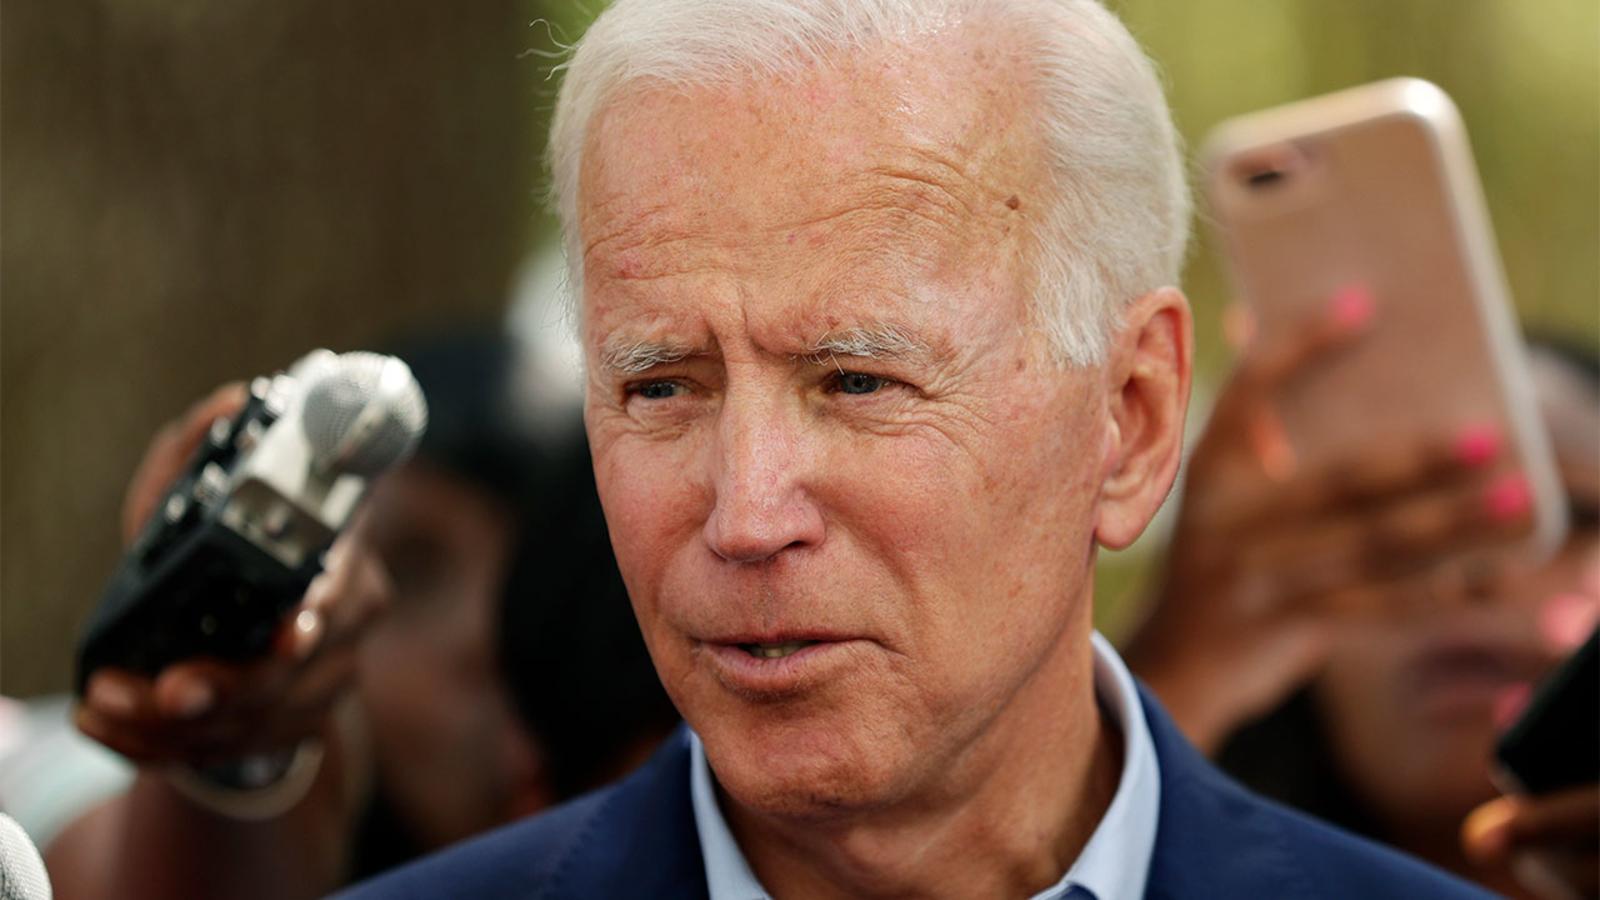 Joe Biden shrugs off age chatter, pledges medical disclosures after 3rd Democratic debate